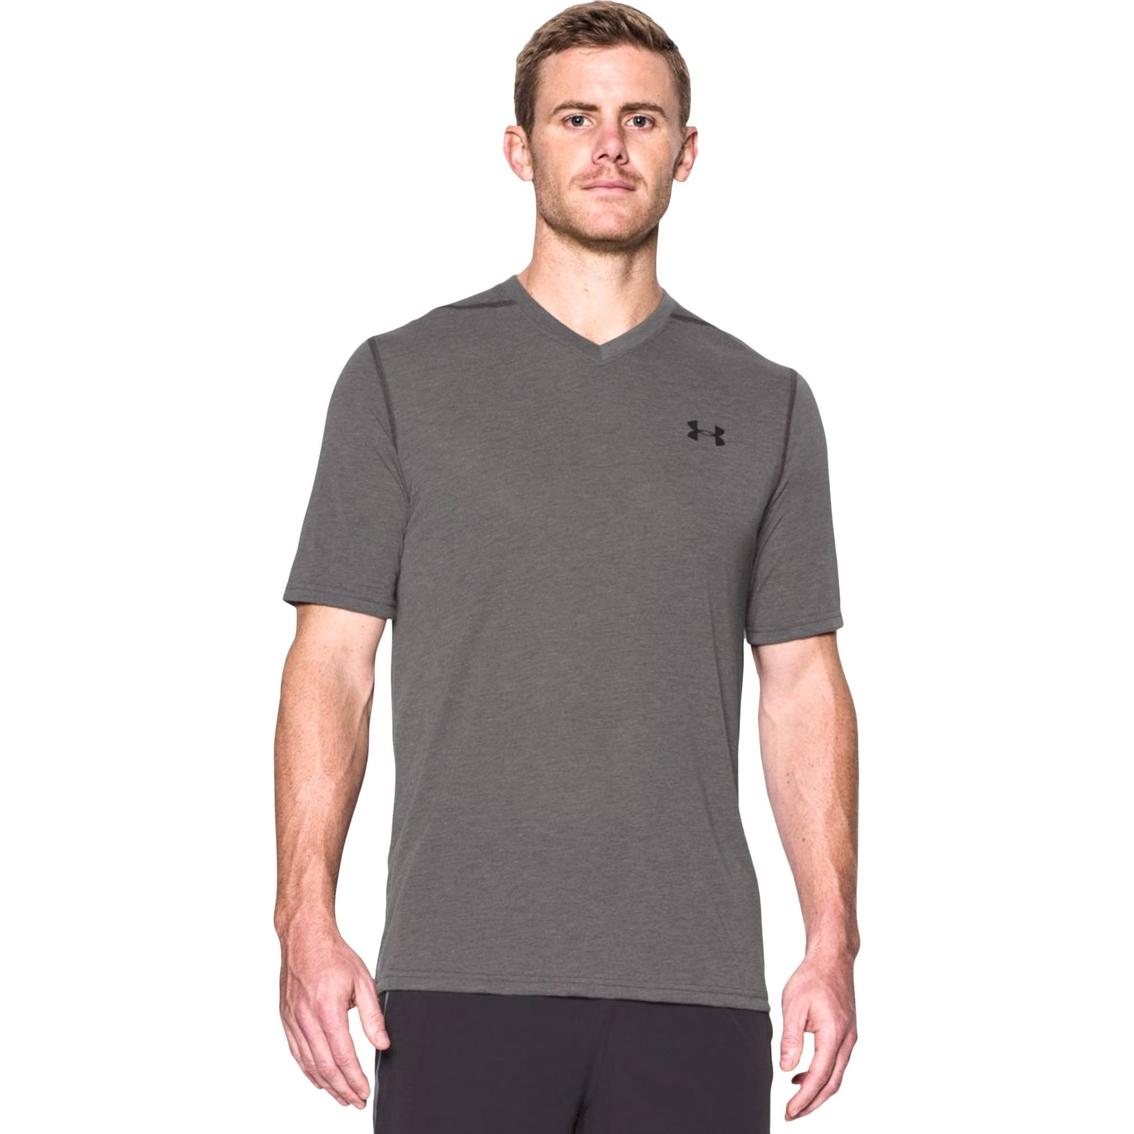 Under Armour Men/'s Threadborne Siro V-Neck T-Shirt Carbon Heather//Black L-XL